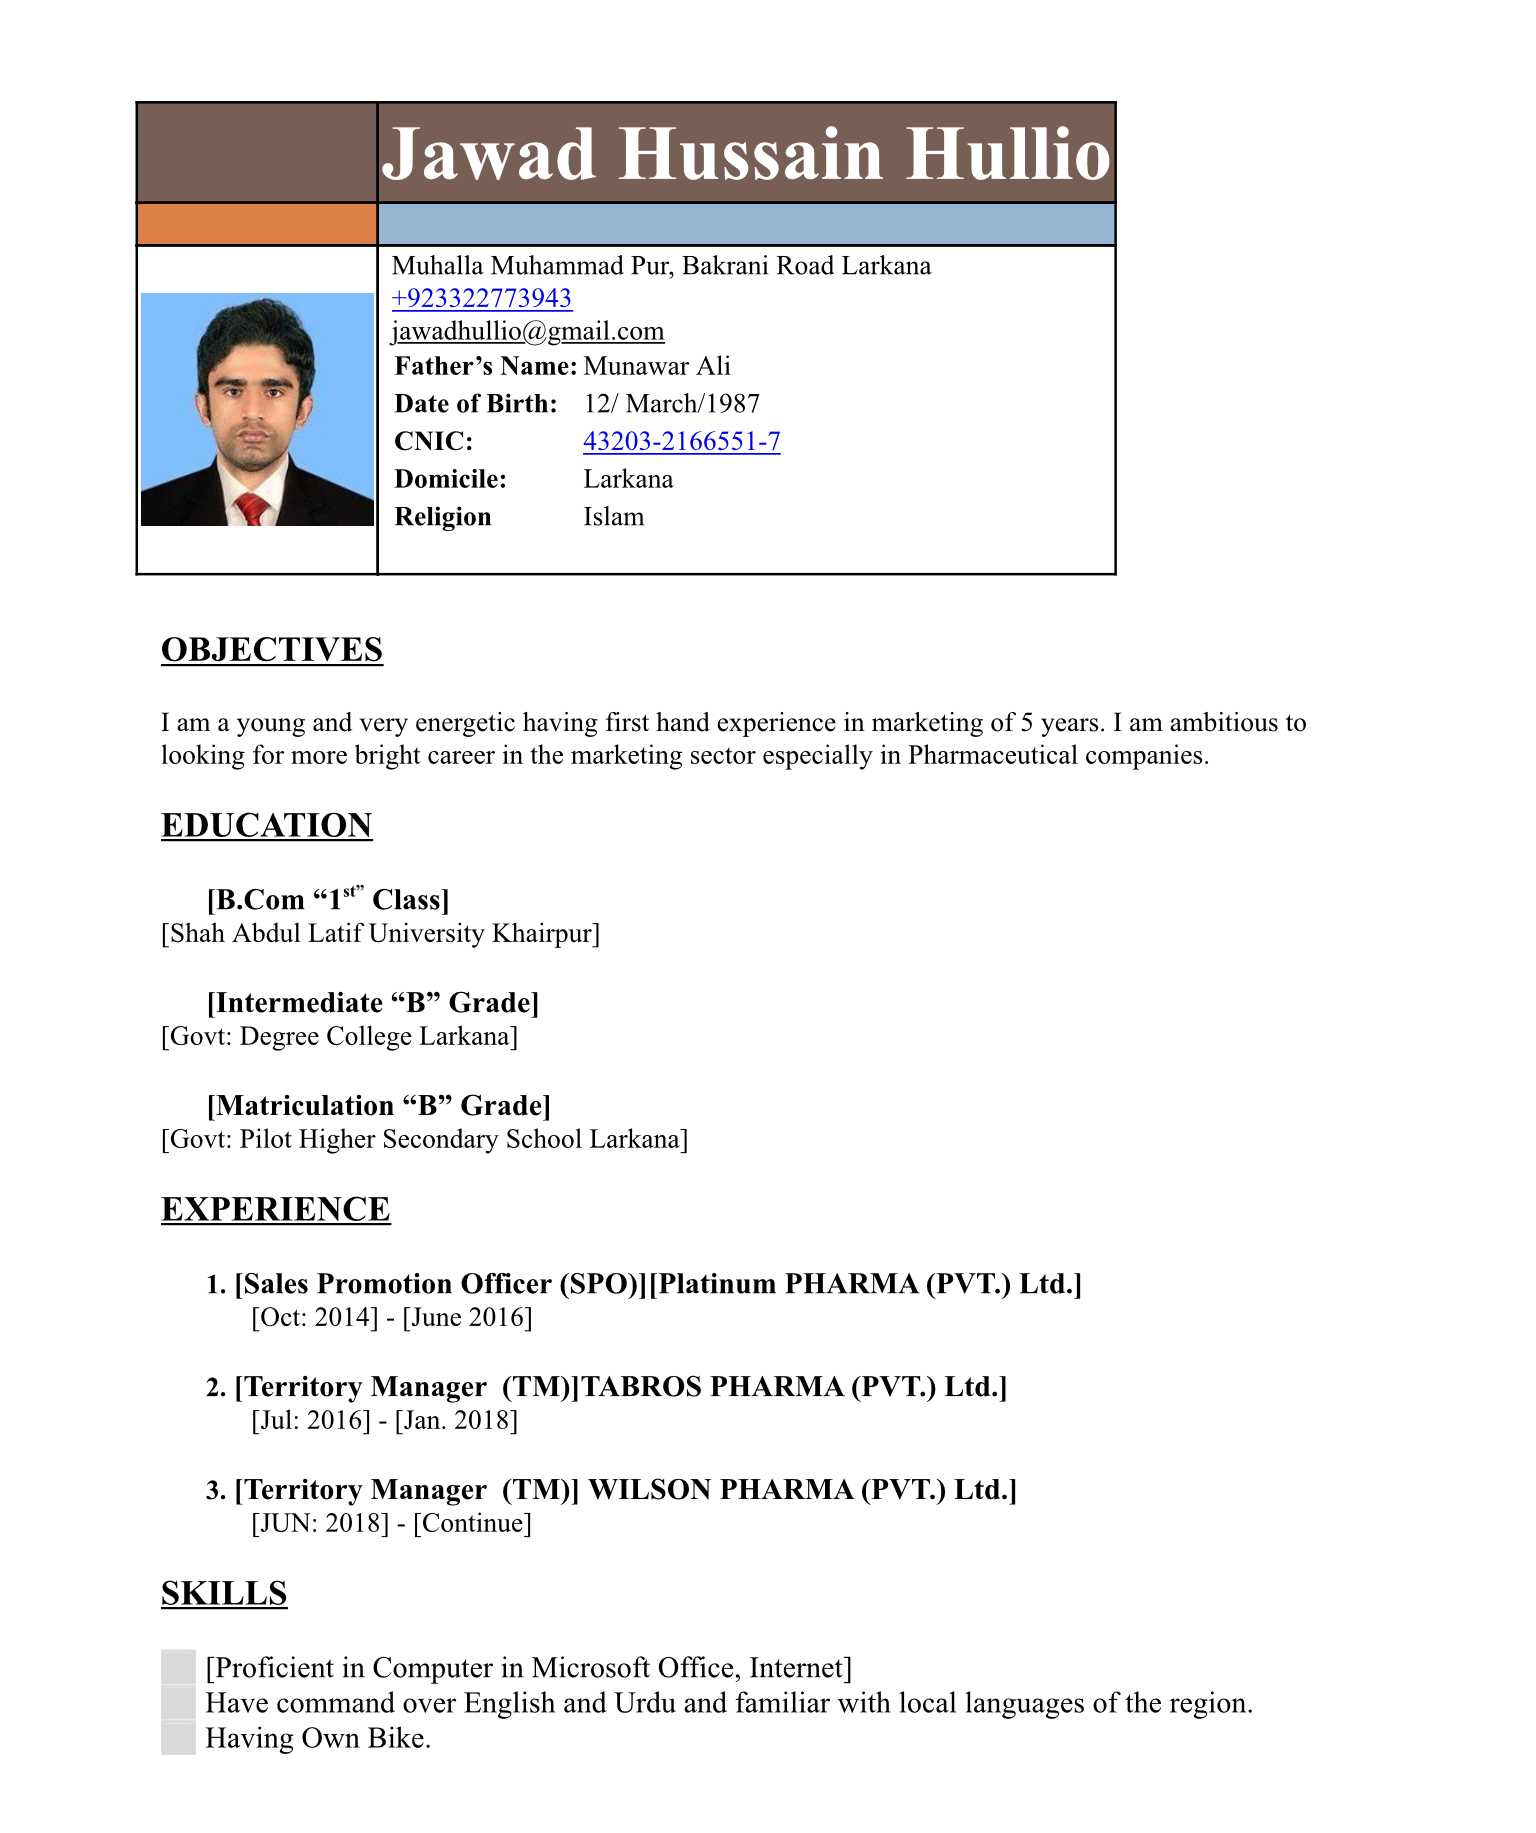 Jawad Hussain Electrical Engineering, IPad, IPhone, Sales, Marketing